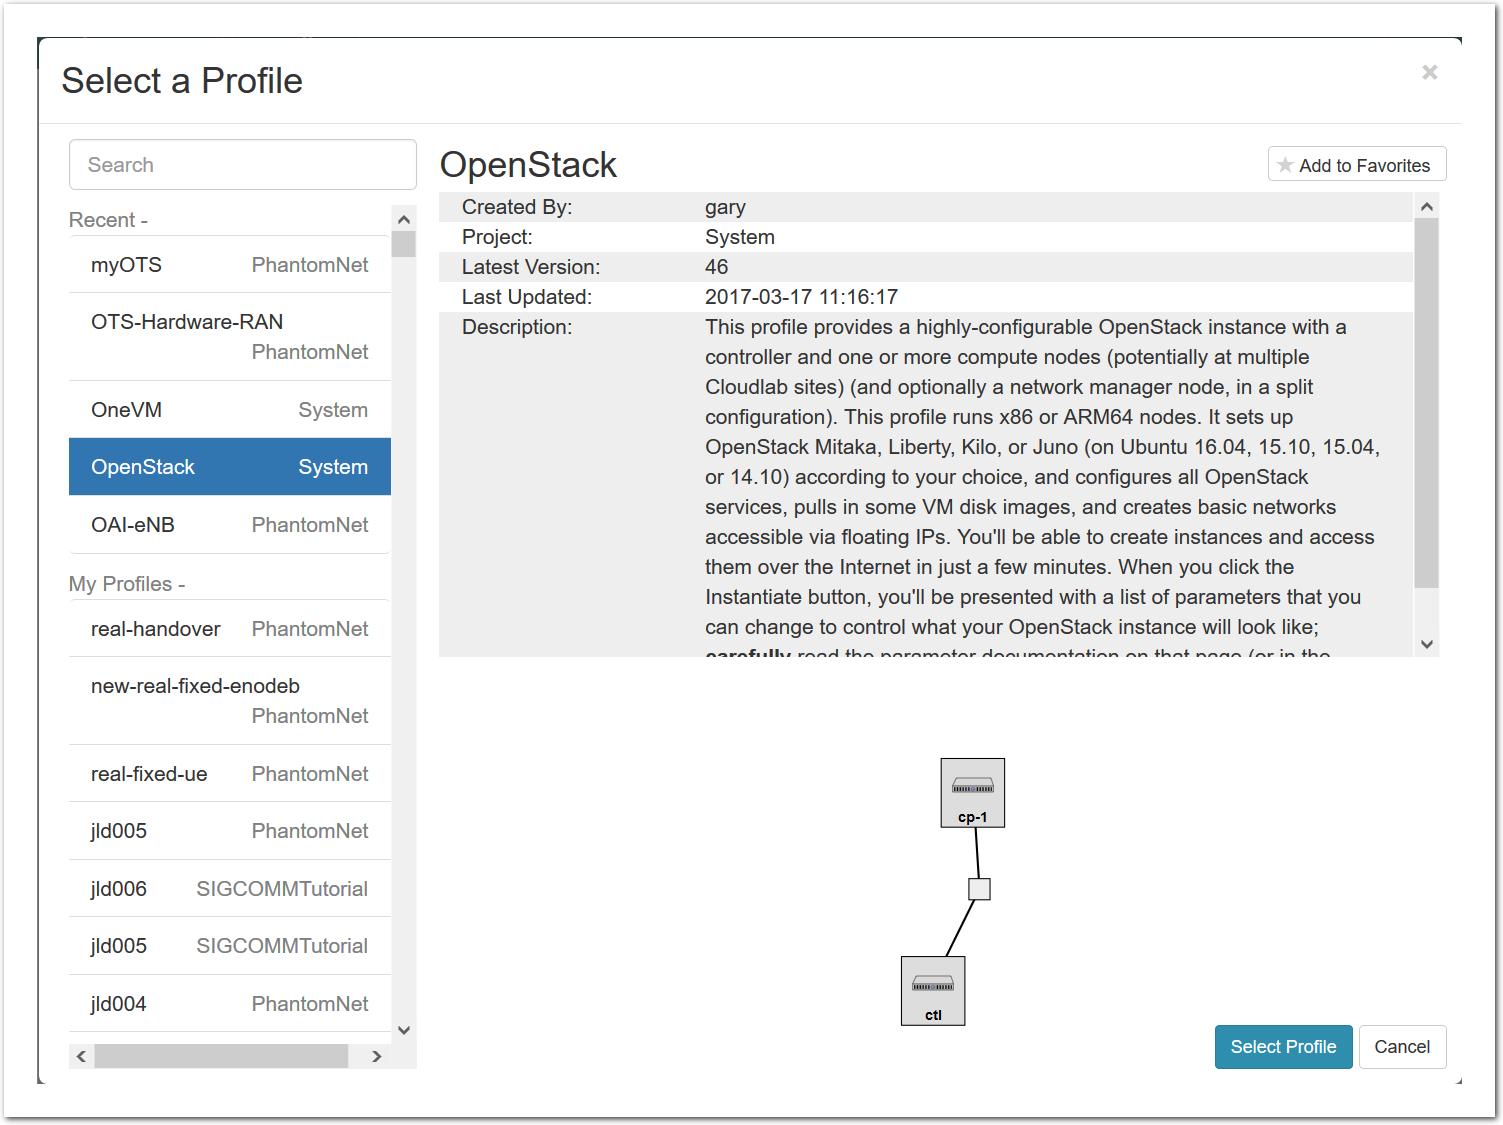 screenshots/elab/select-profile.png